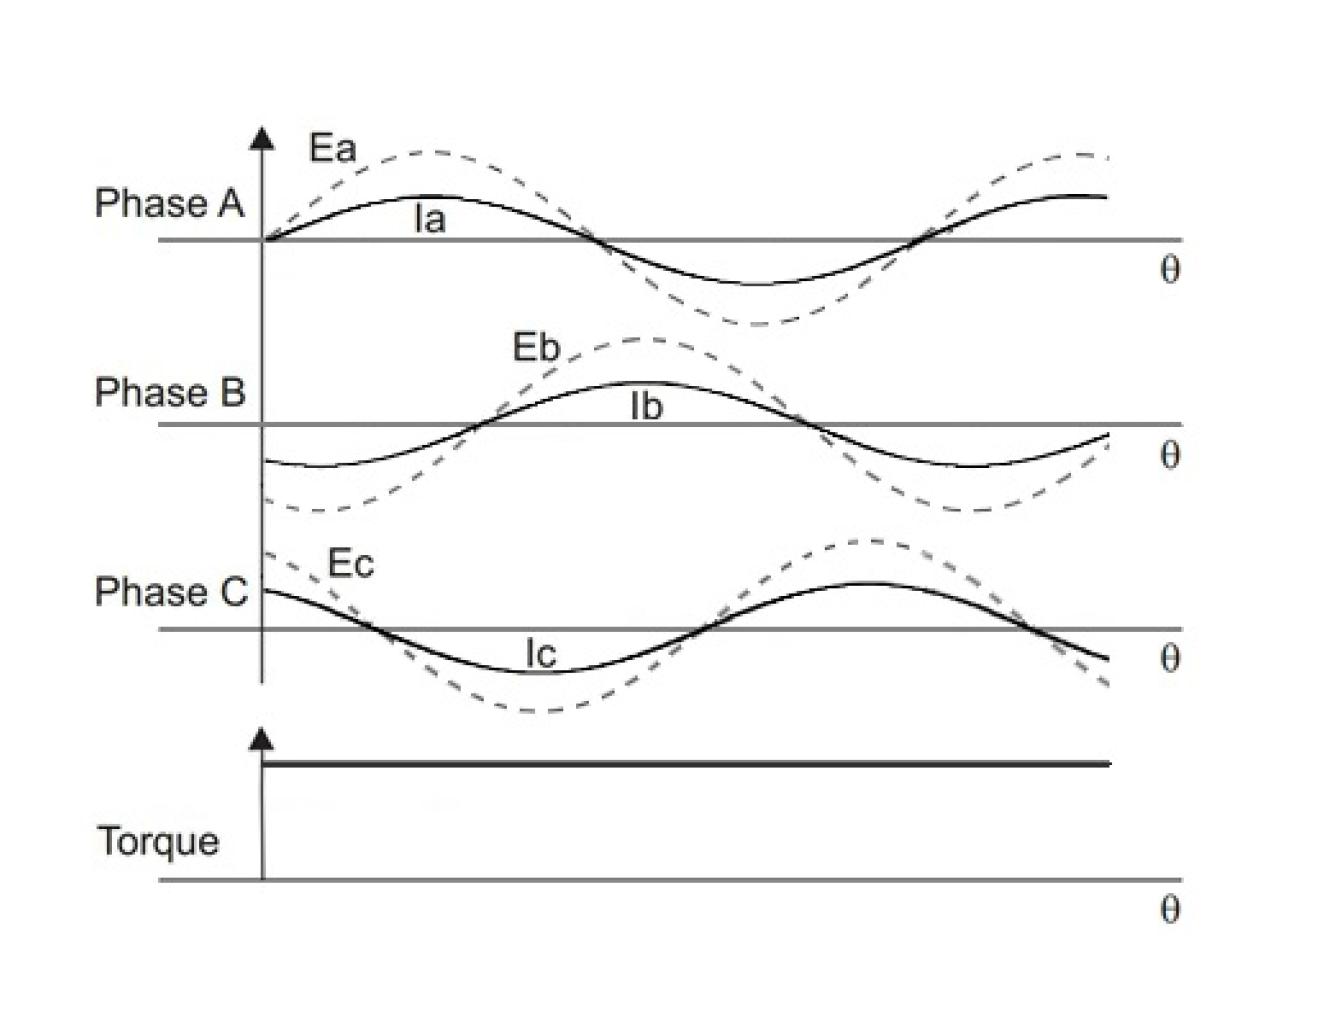 Sinusoidal mode - Servo drives